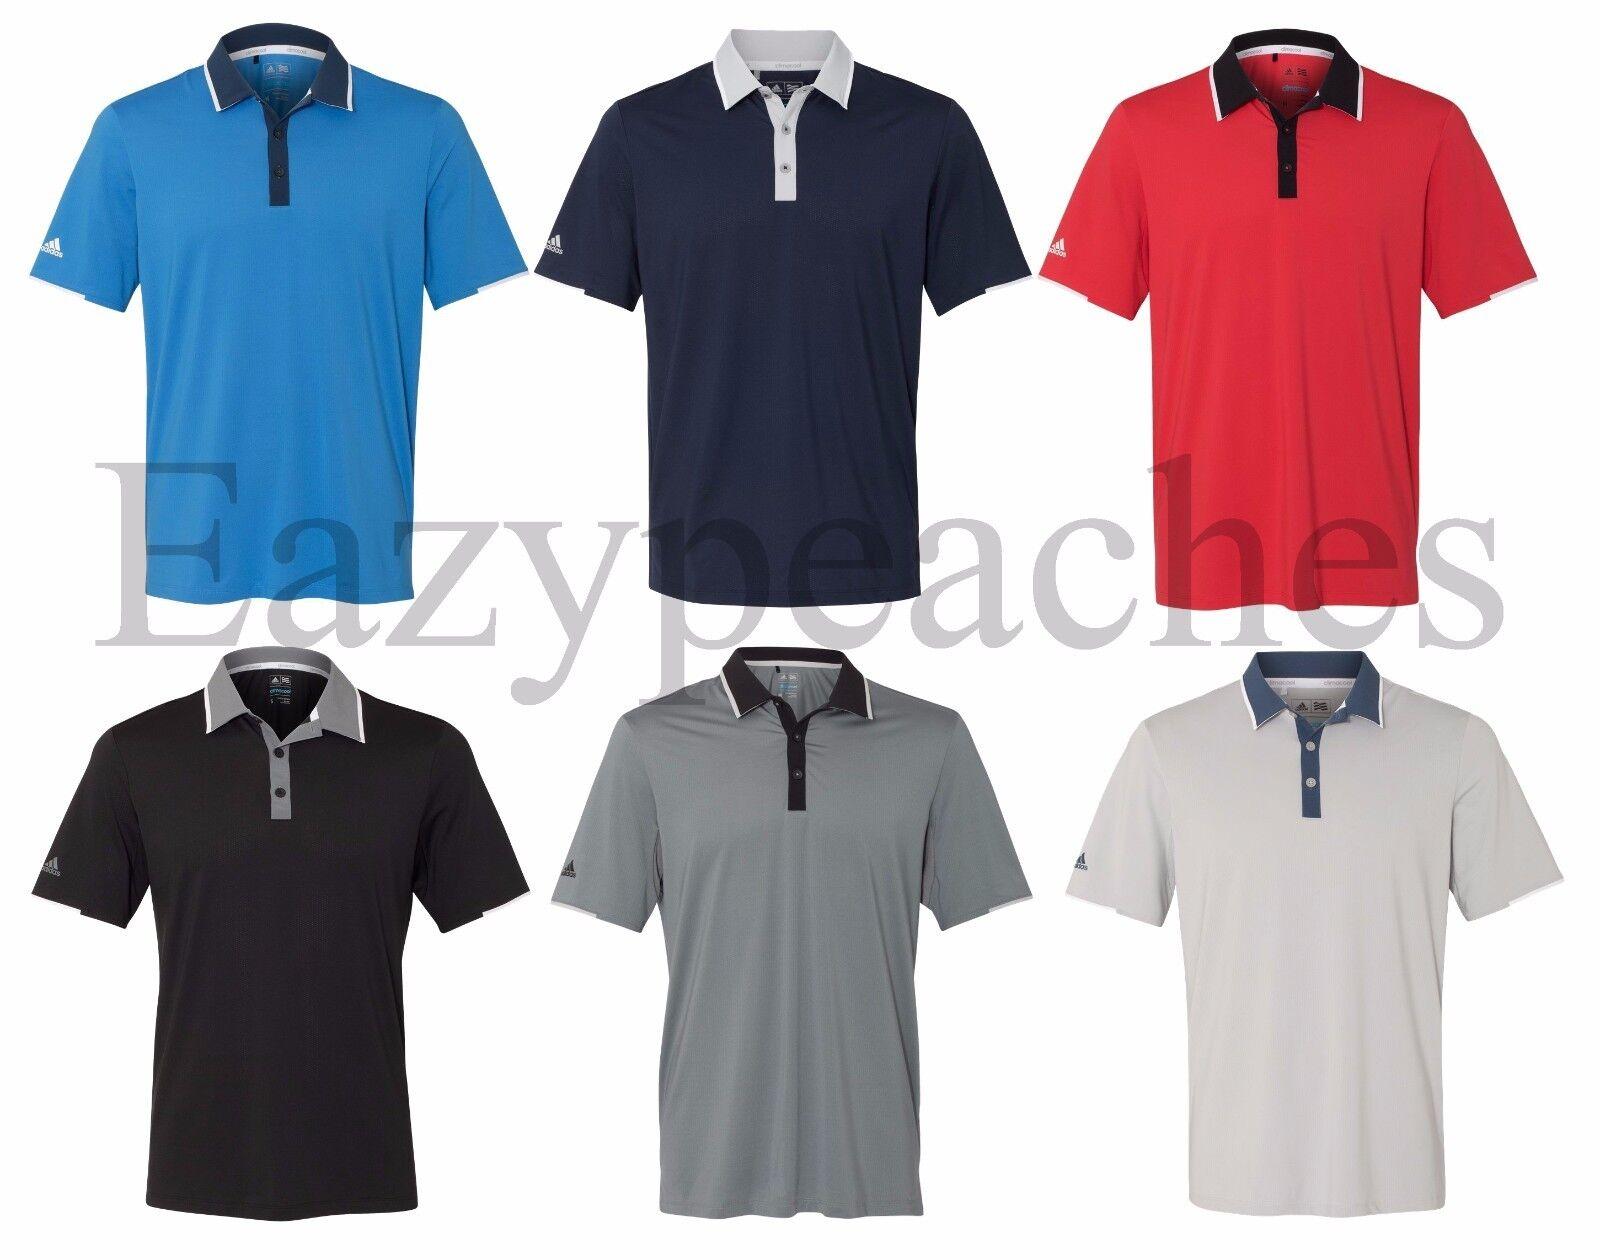 f62c9848db1 ADIDAS GOLF - Climacool Performance Polo Mens Size S-3XL Sport Shirt ...